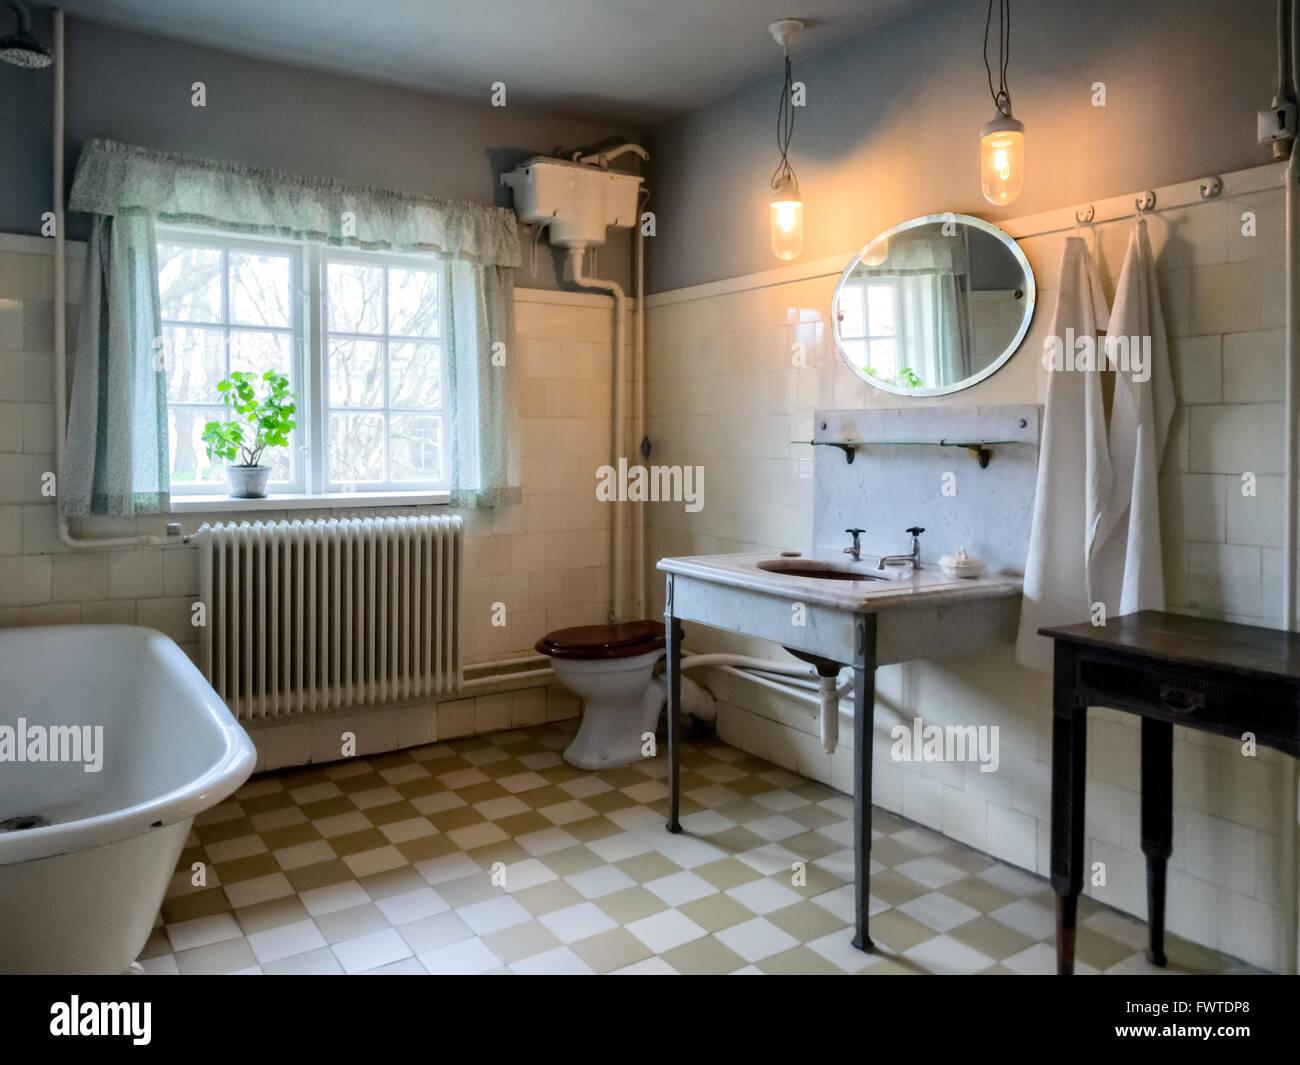 Vintage Badezimmer Stockfotos & Vintage Badezimmer Bilder - Alamy